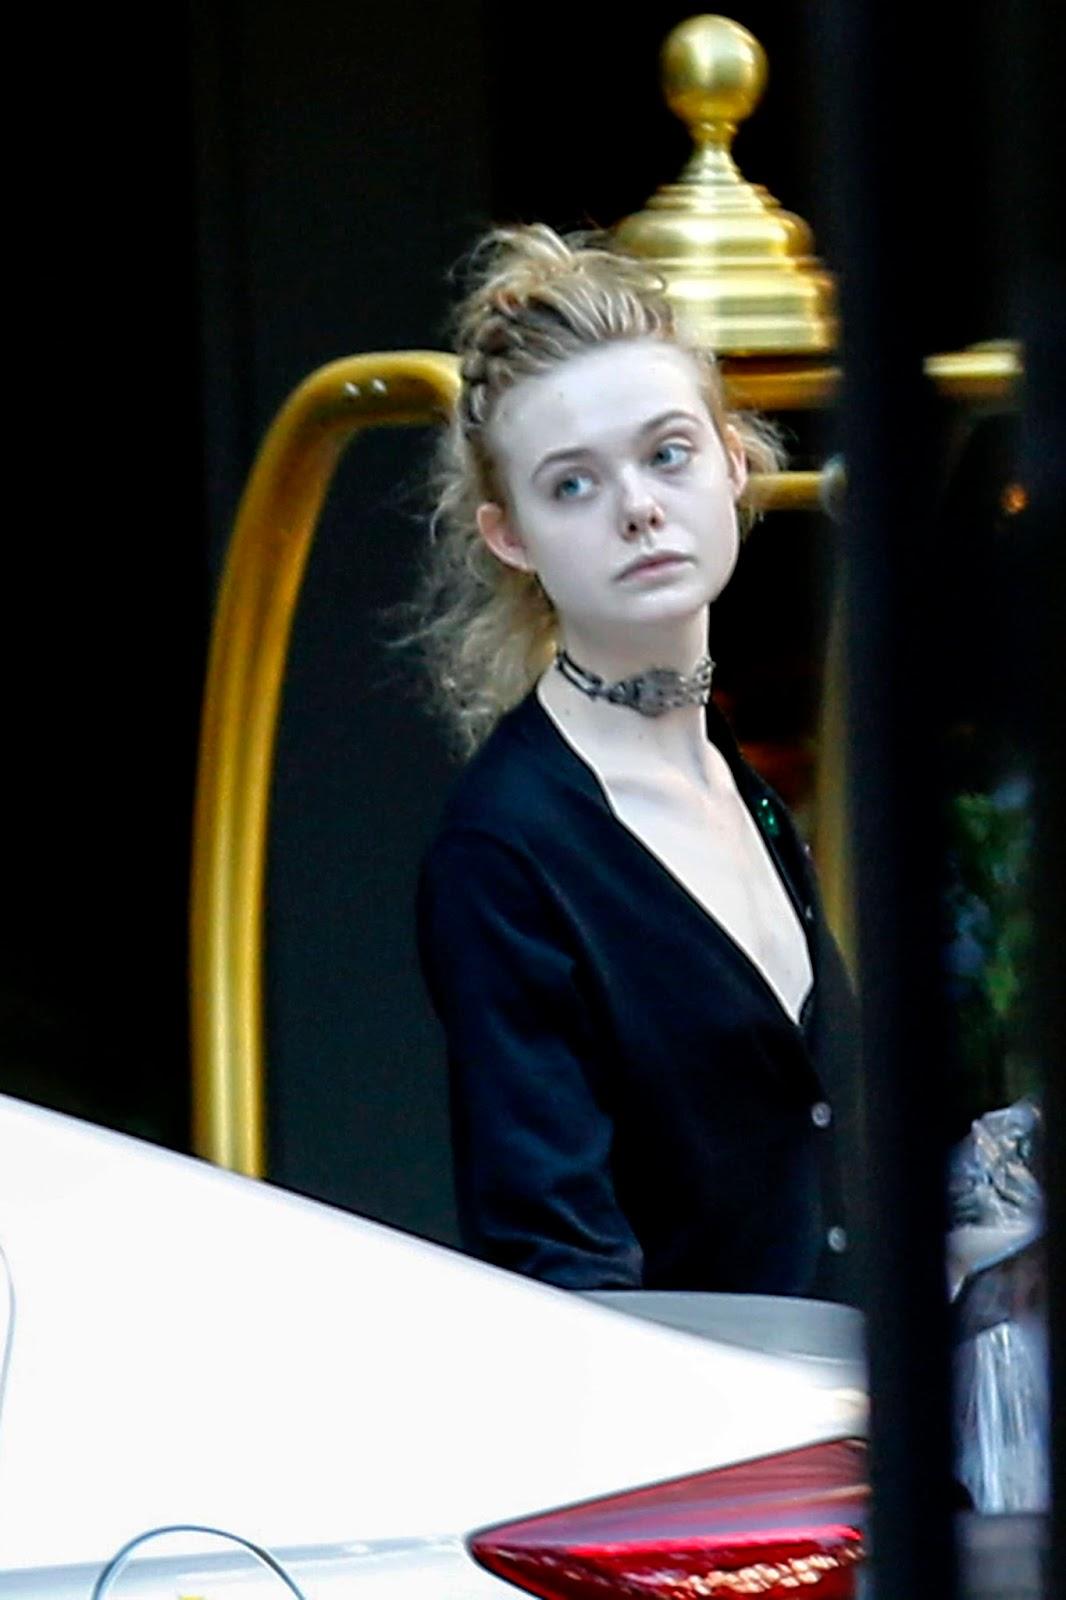 Elle Fanning Leaving Her Hotel in New Orleans, October 29, 2016